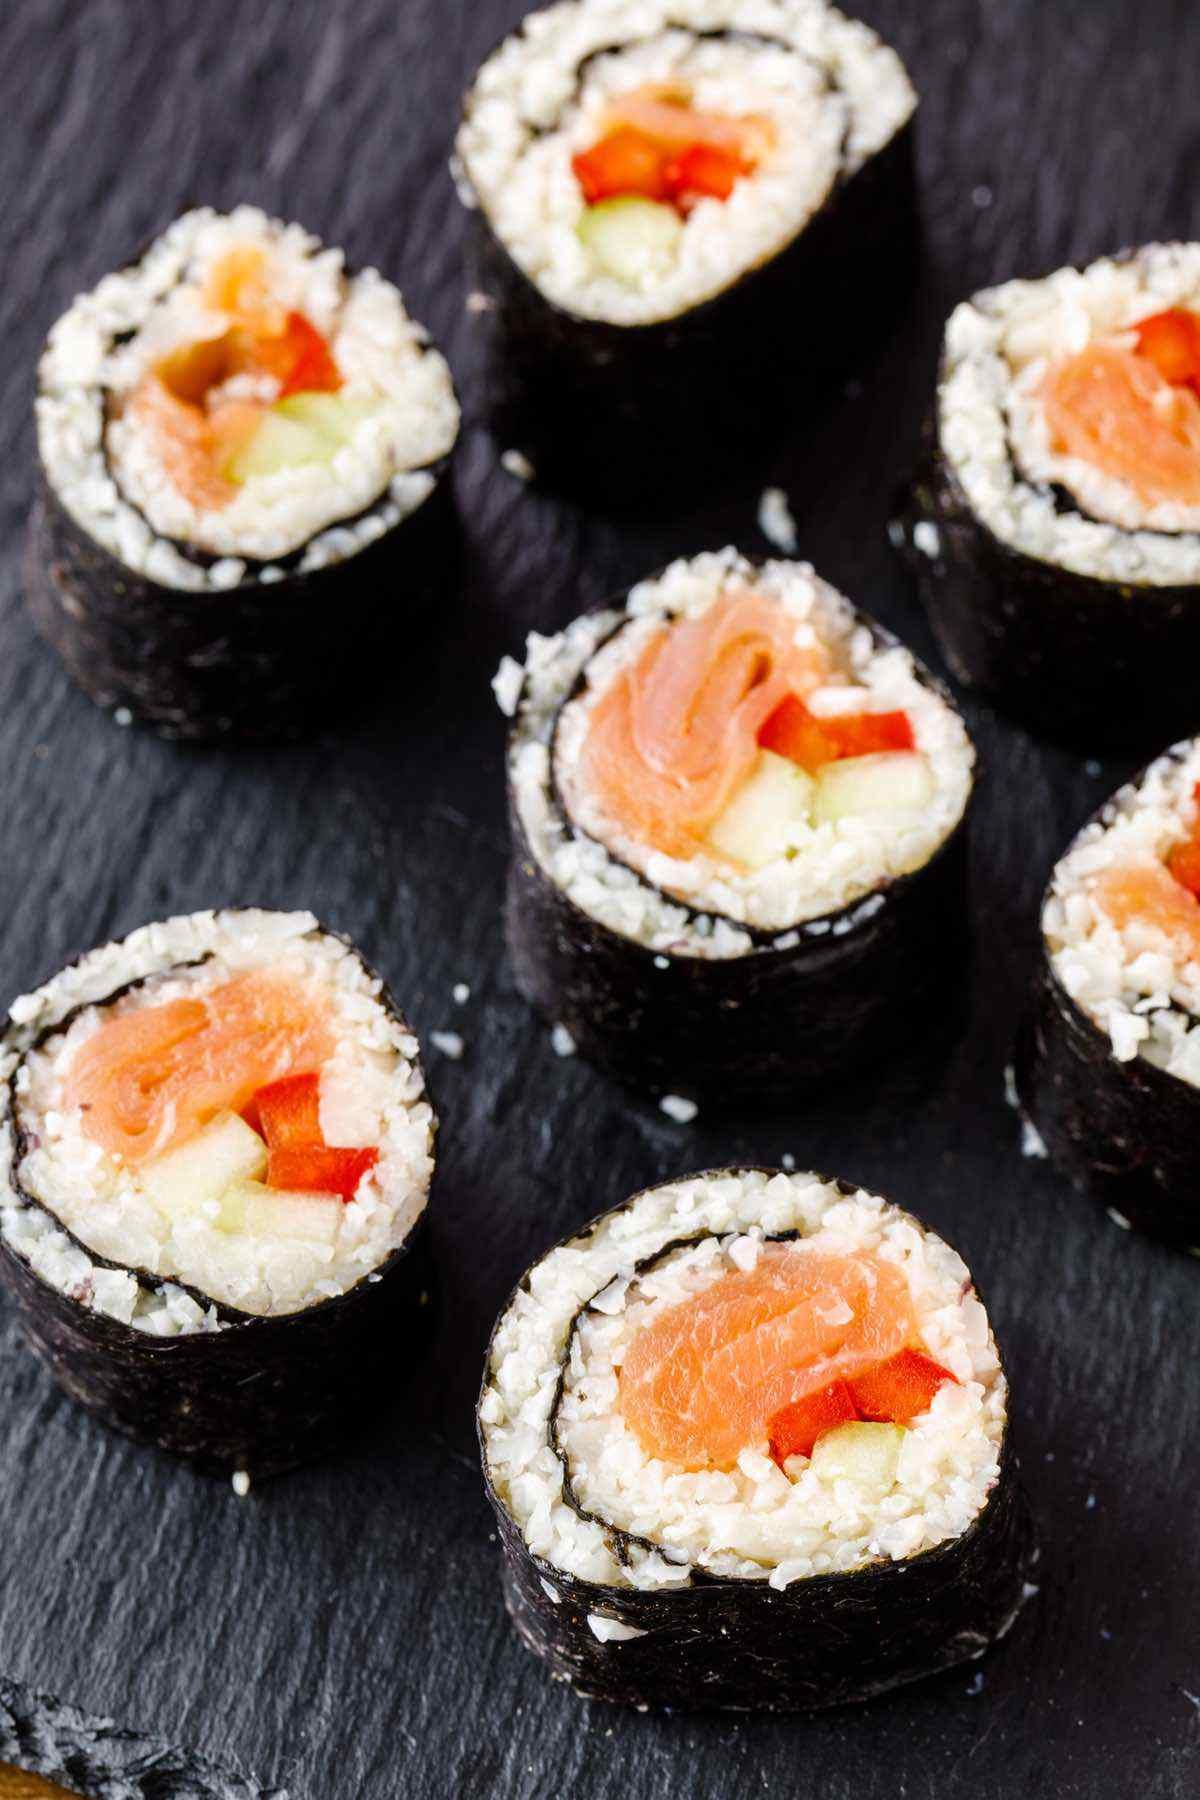 prepared sushi rolls